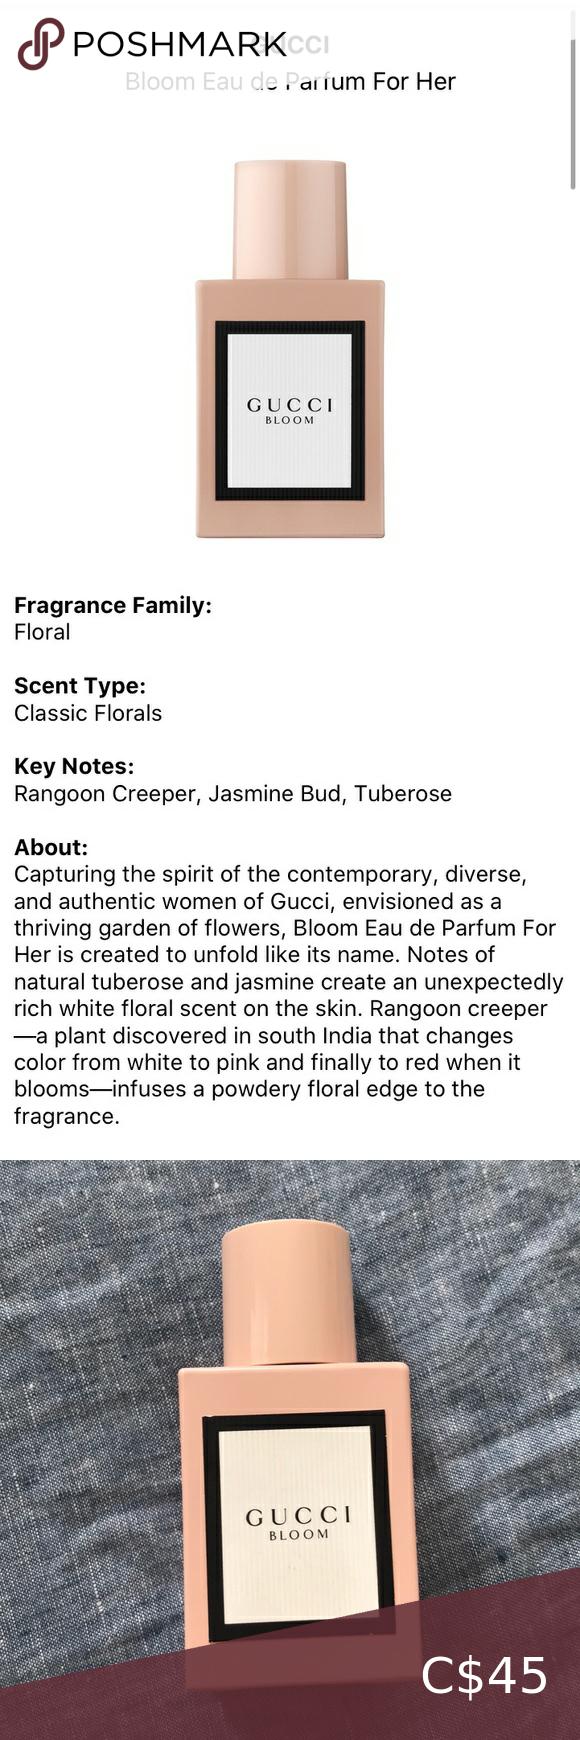 80 Gucci Bloom Parfume Floral Scent Bloom Floral